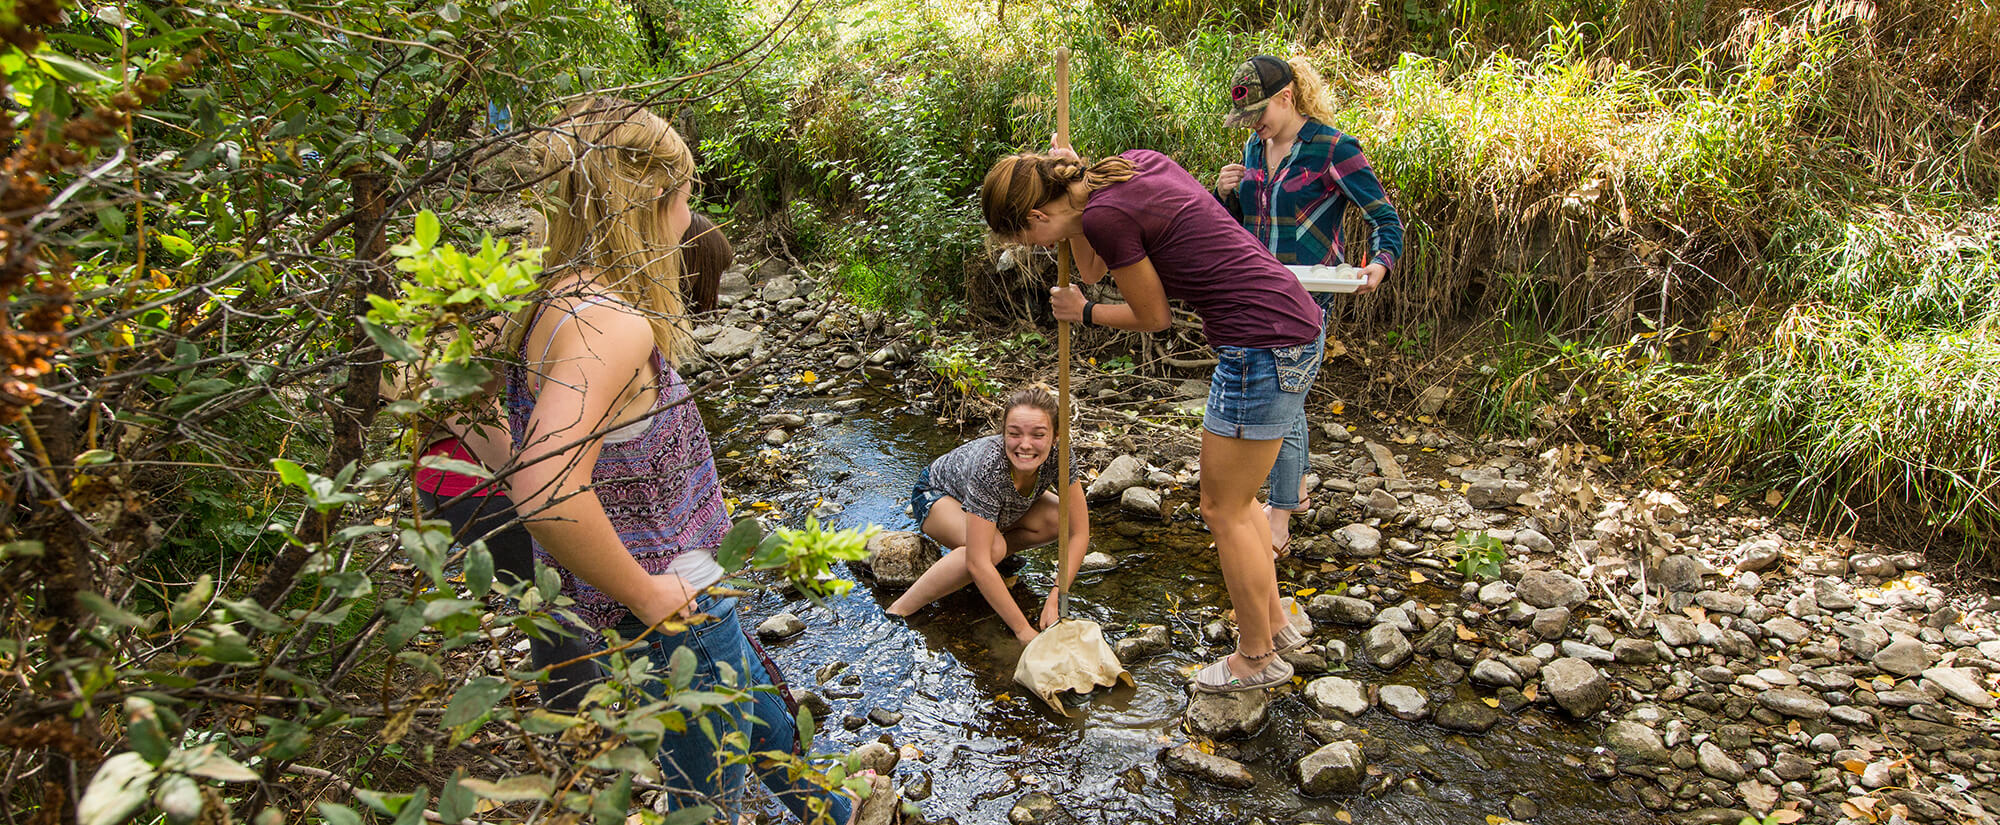 Students look for specimens in a stream near Casper Mountain.